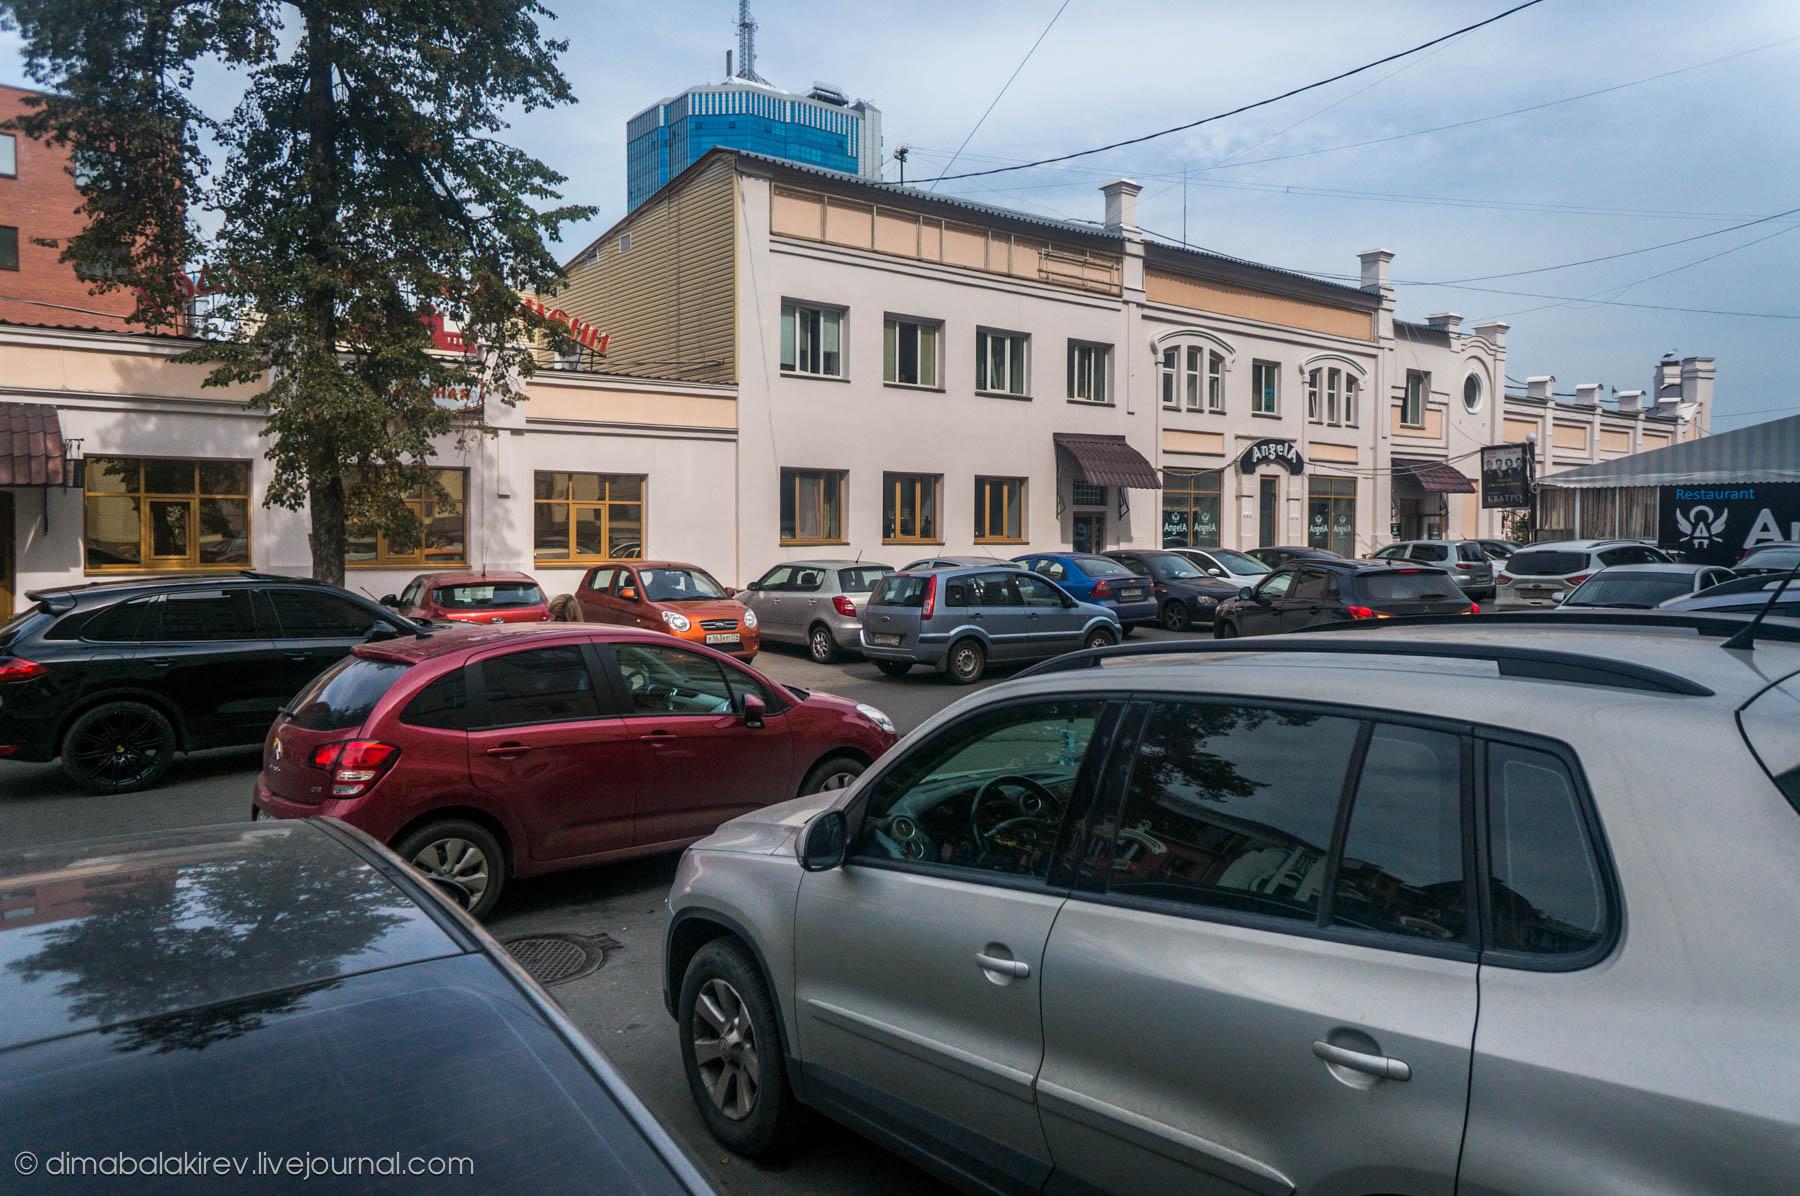 Прогулка по Челябинску